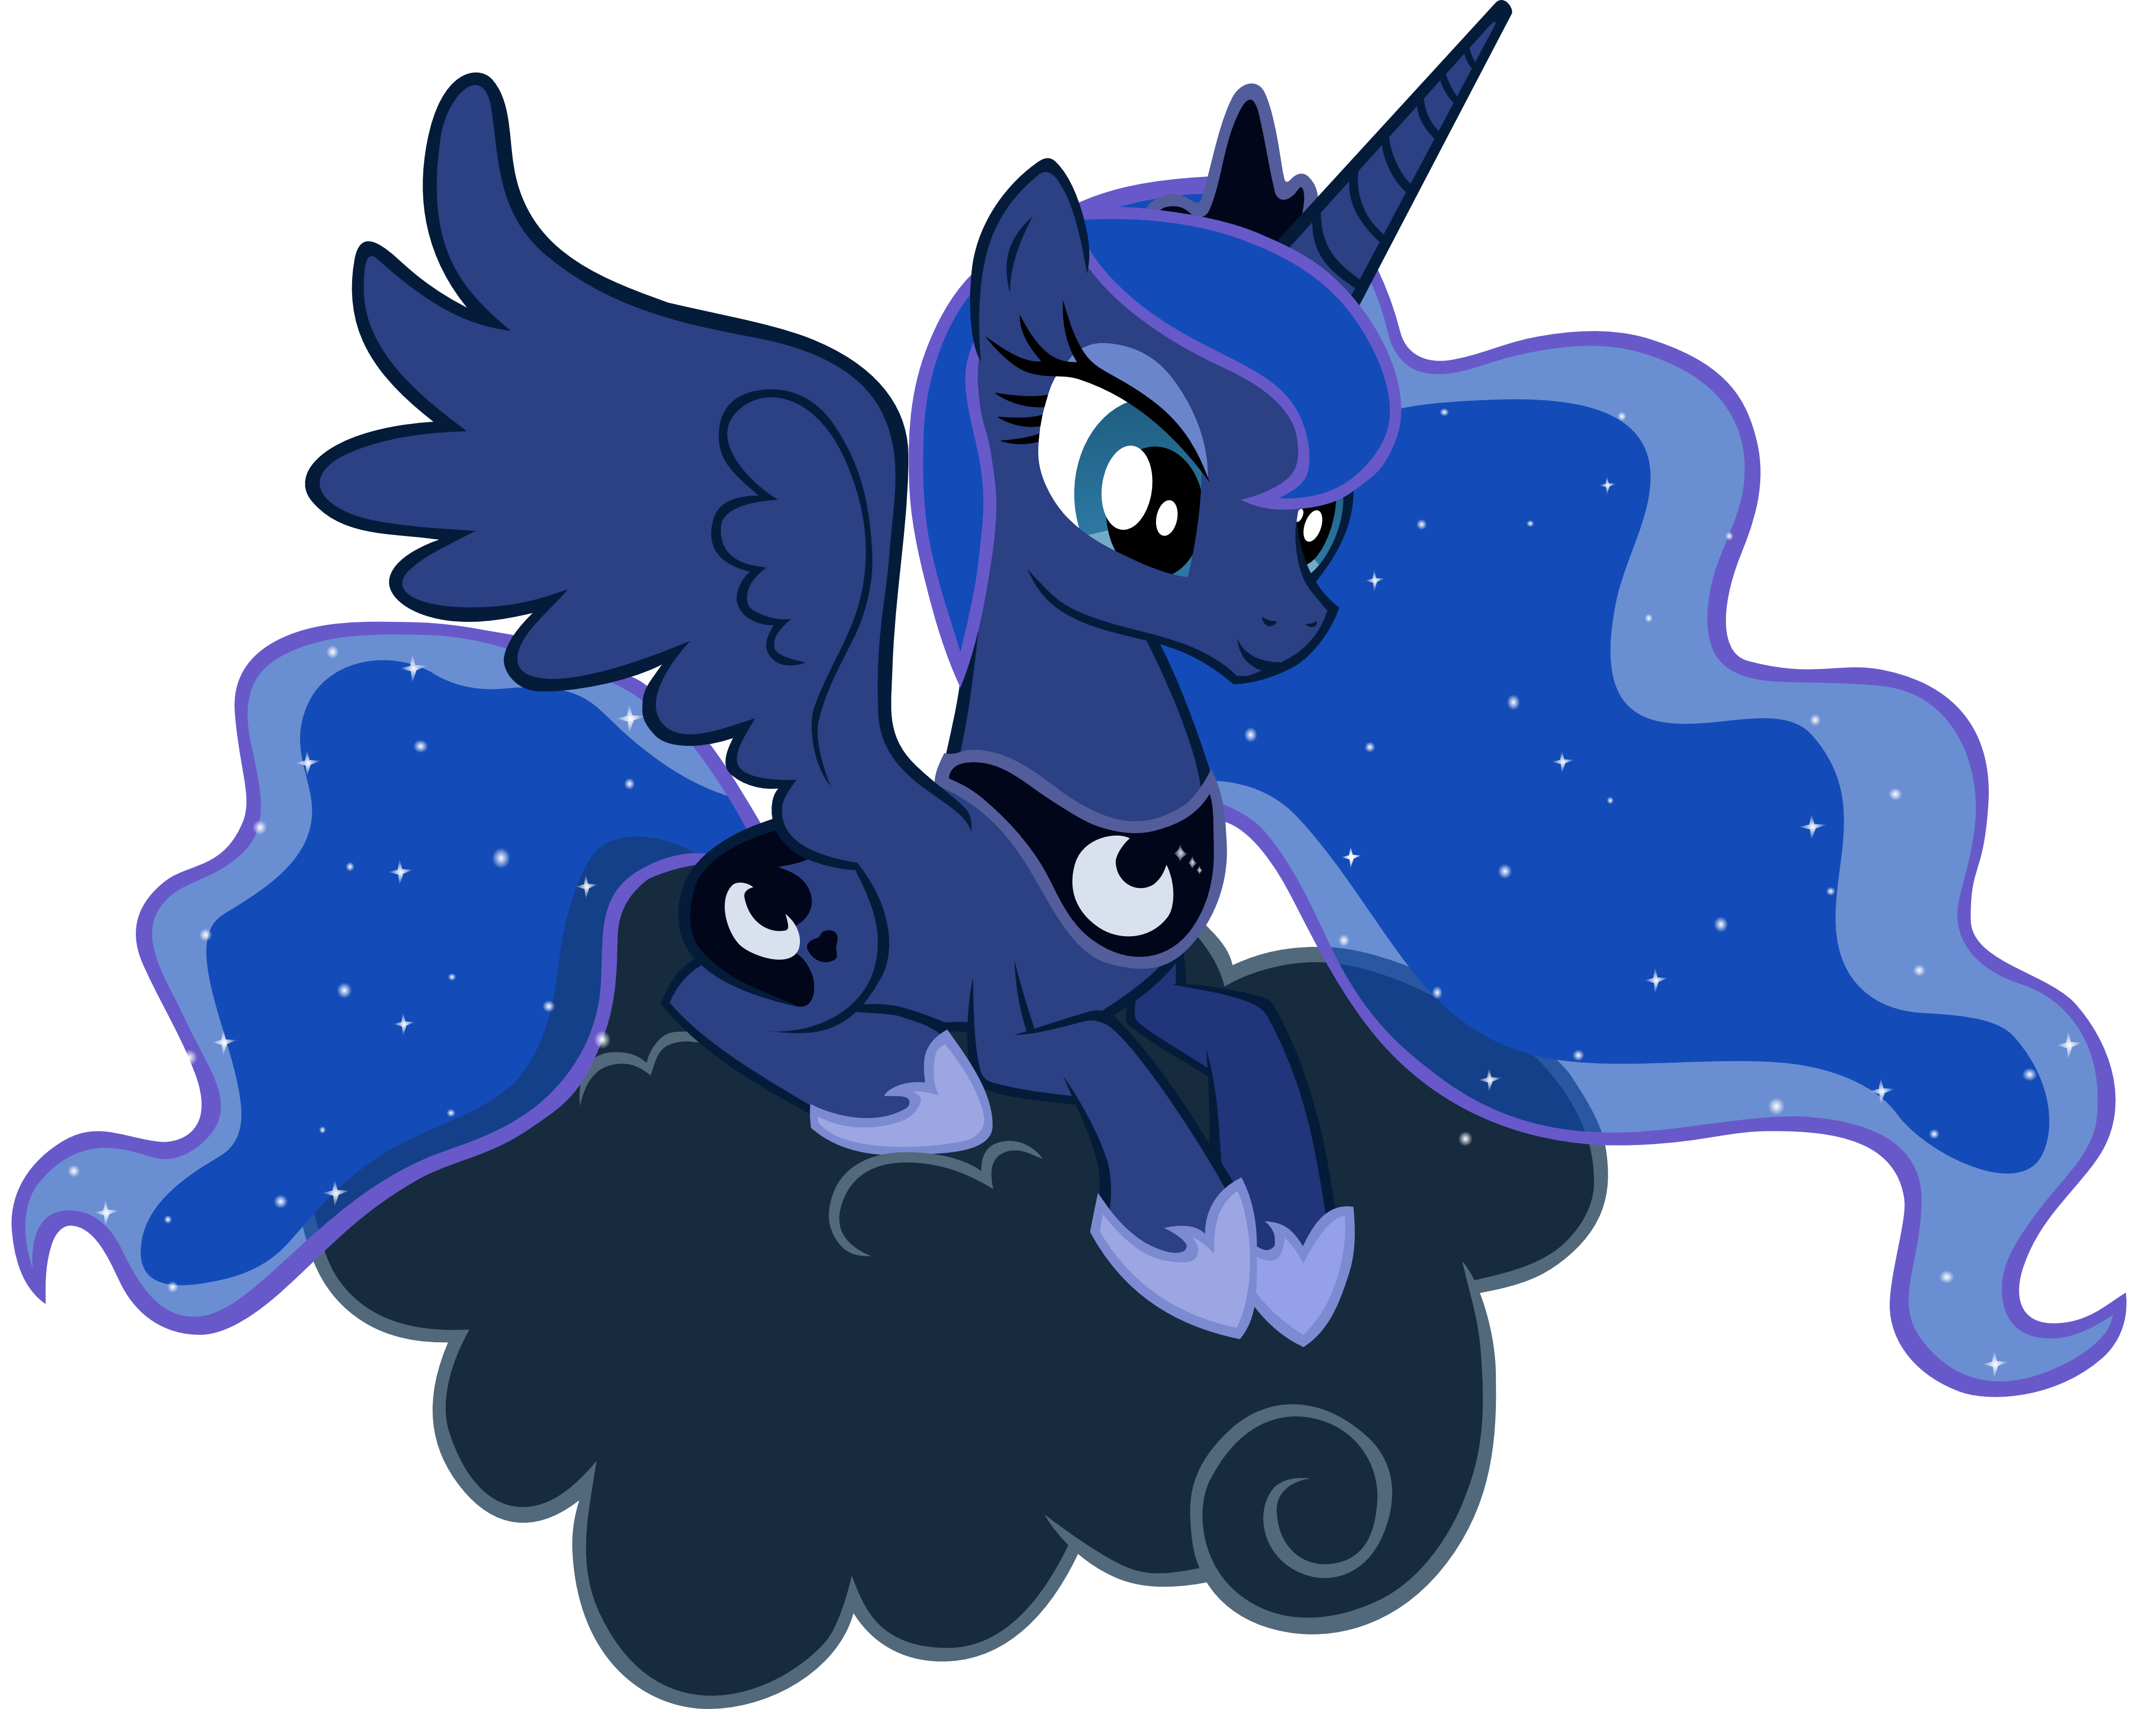 Plaatje My Little Pony 187 Animaatjes Nl